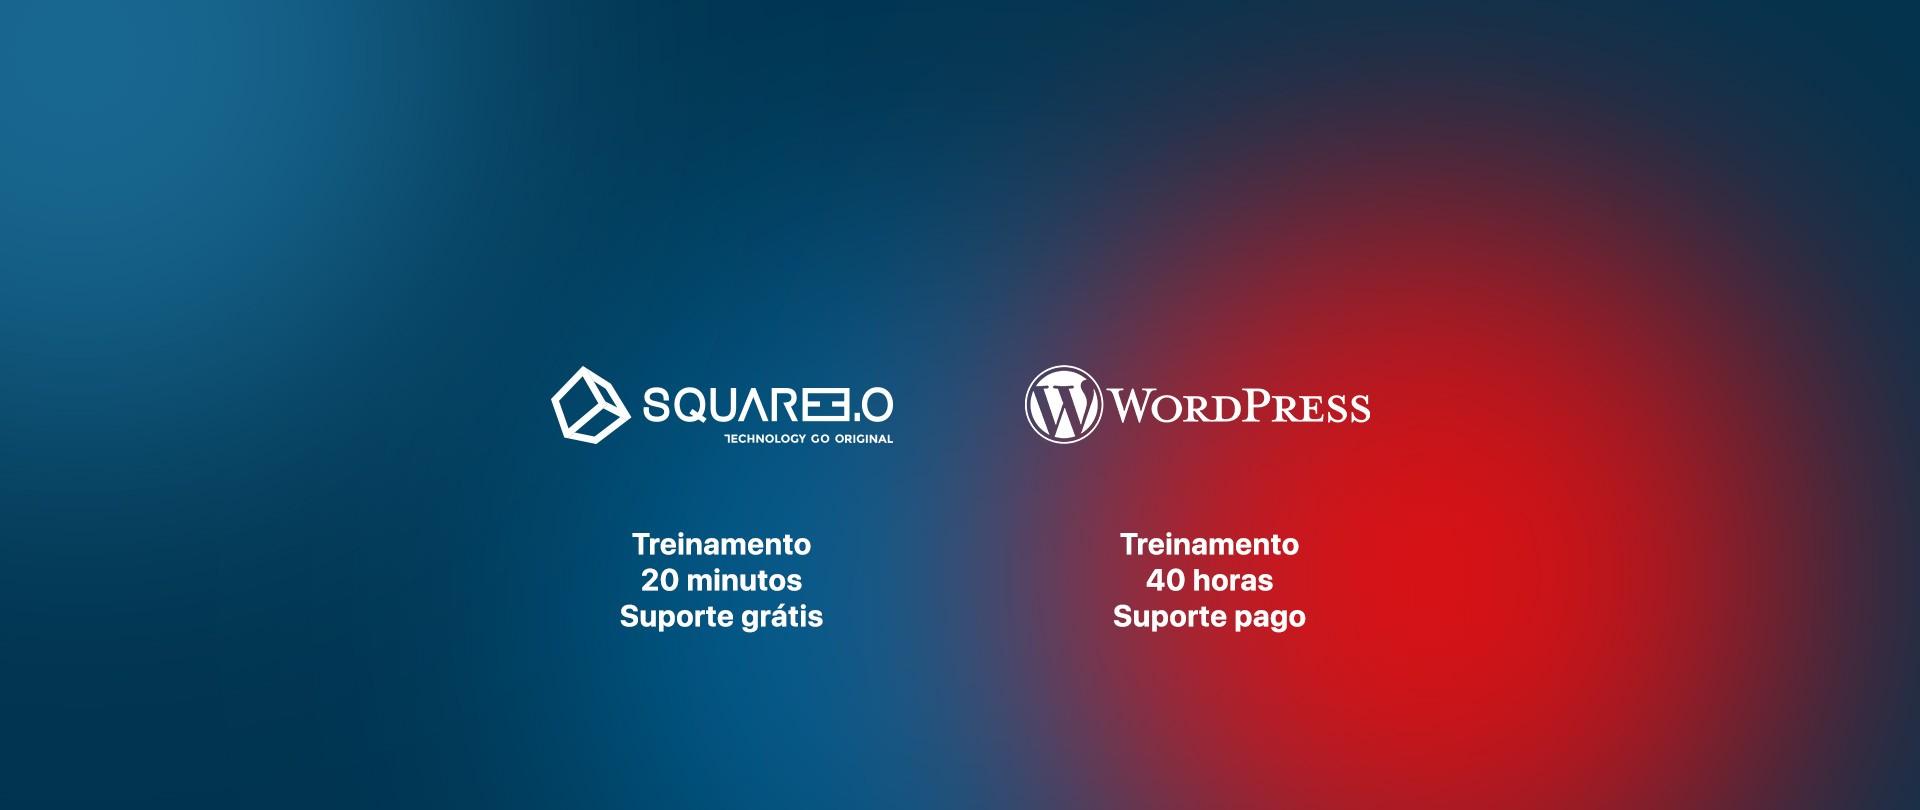 Foto: SQUARE 3.0 versus Wordpress, entenda a diferença!